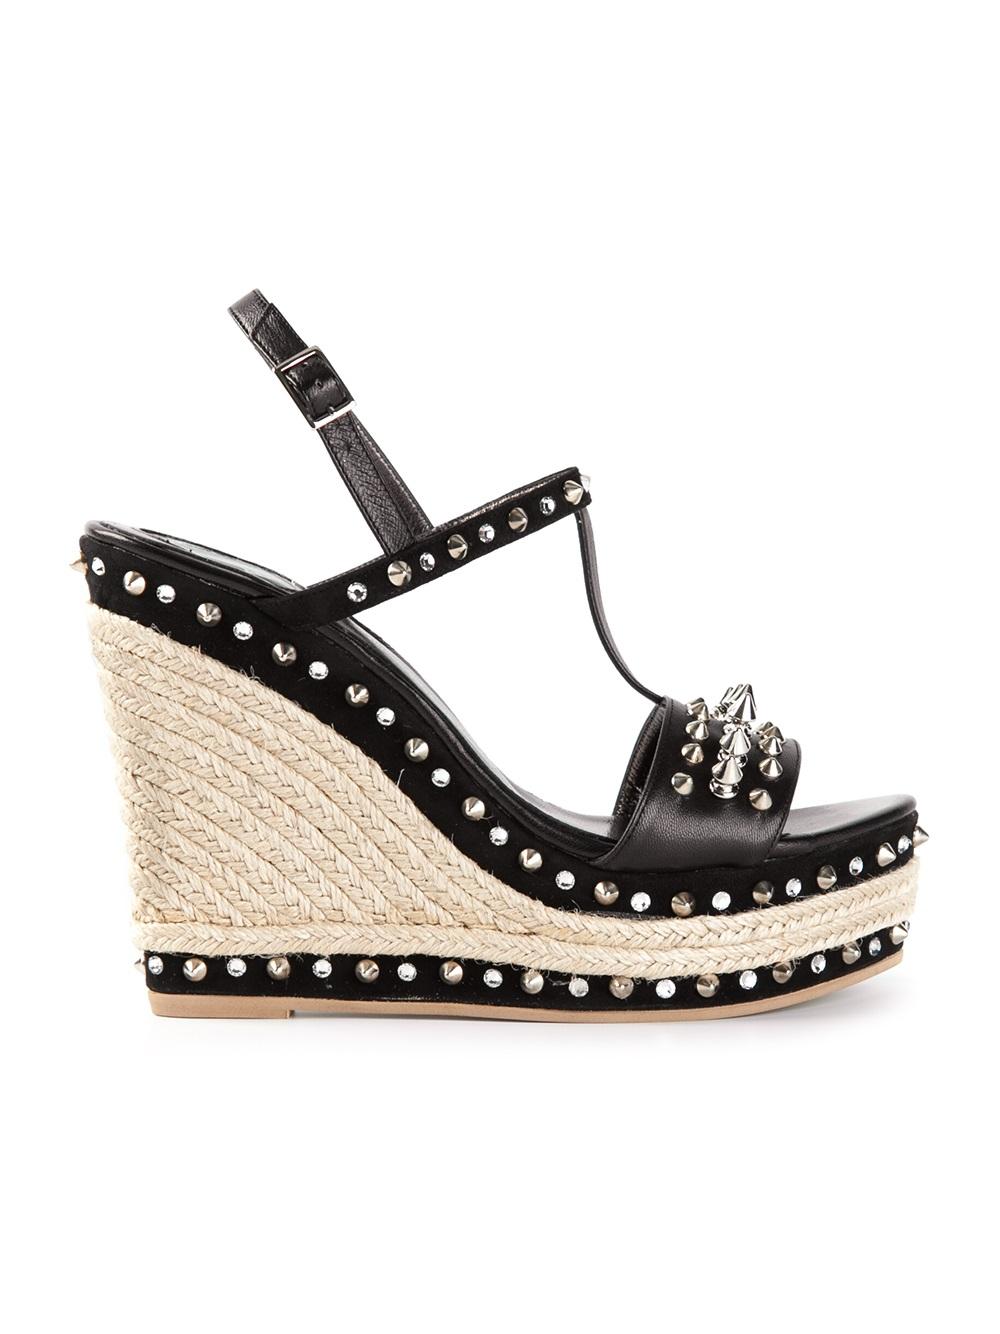 Philipp Plein Shoes Studded Heels